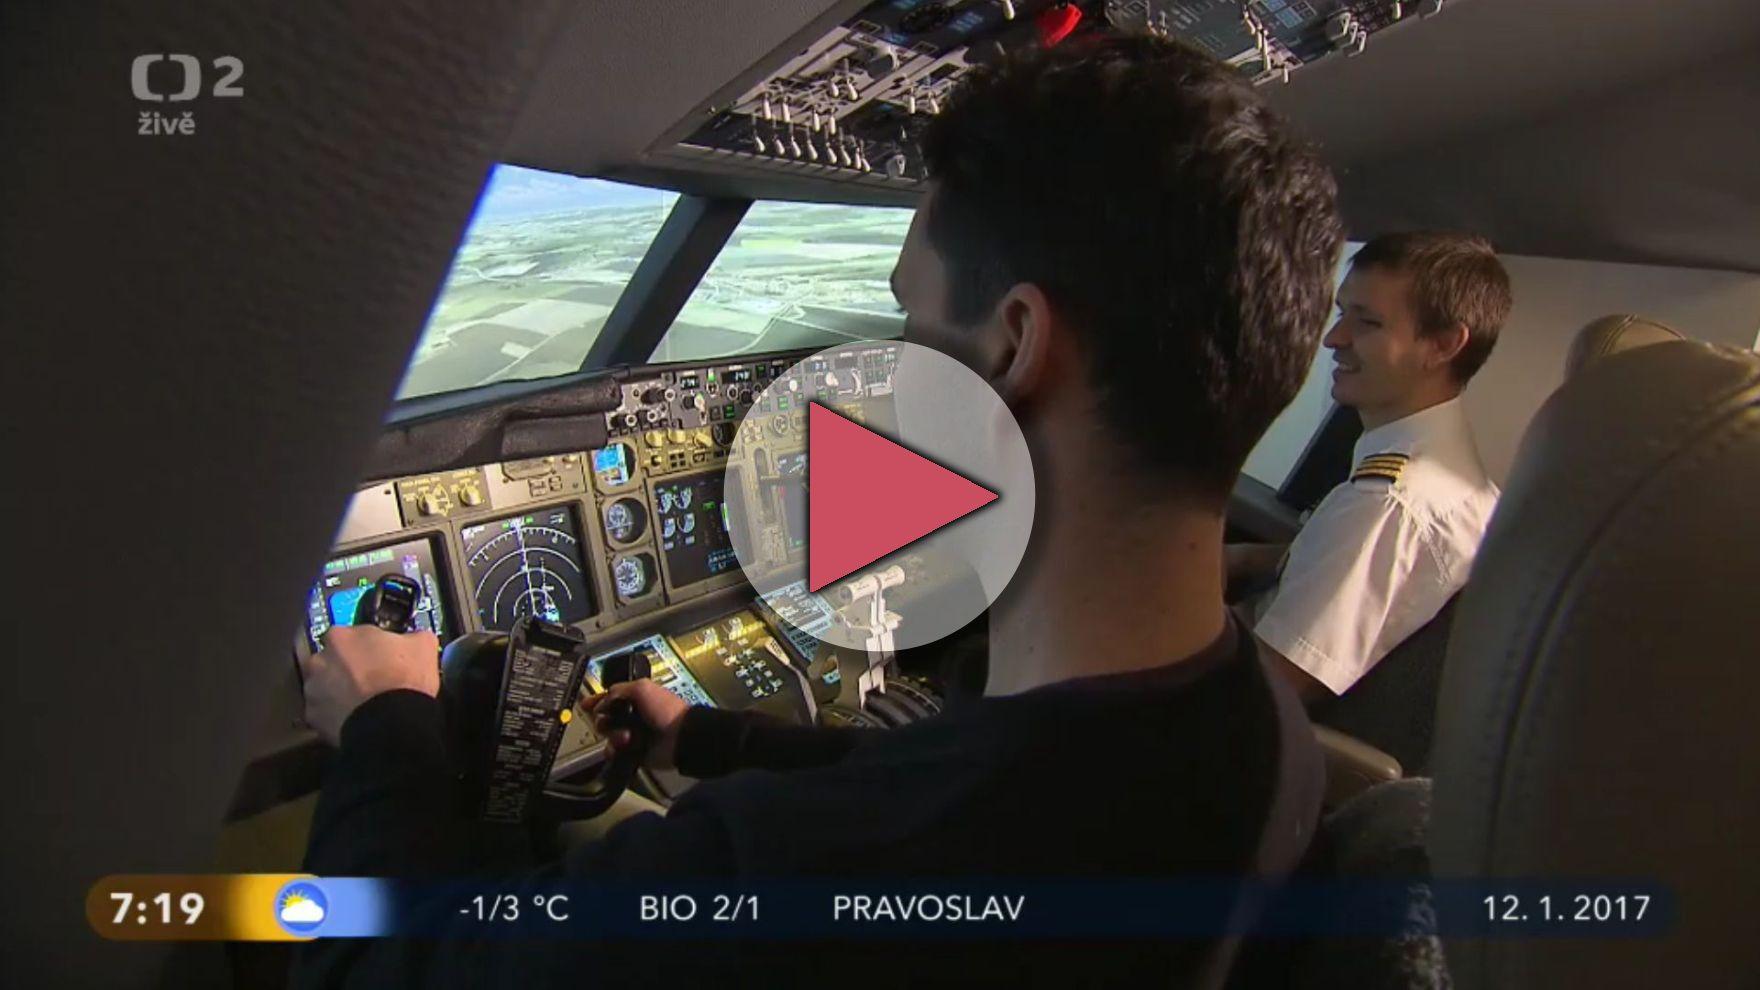 AirWine_ceska televize_play